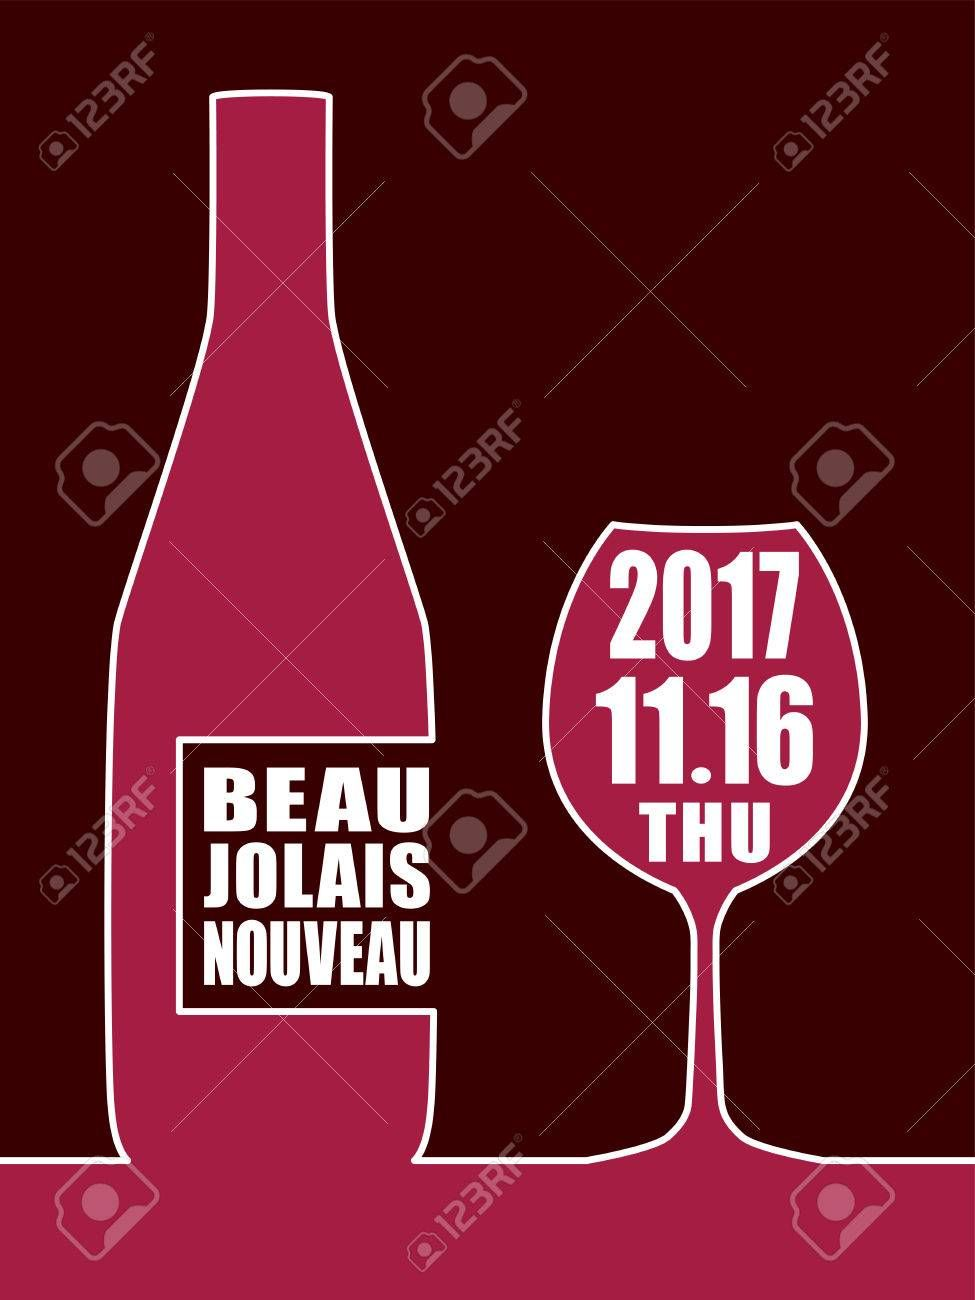 Beaujolais Nouveau Vector Background Sponsored Nouveau Beaujolais Background Vector Interior Design Kitchen Gaming Logos Design